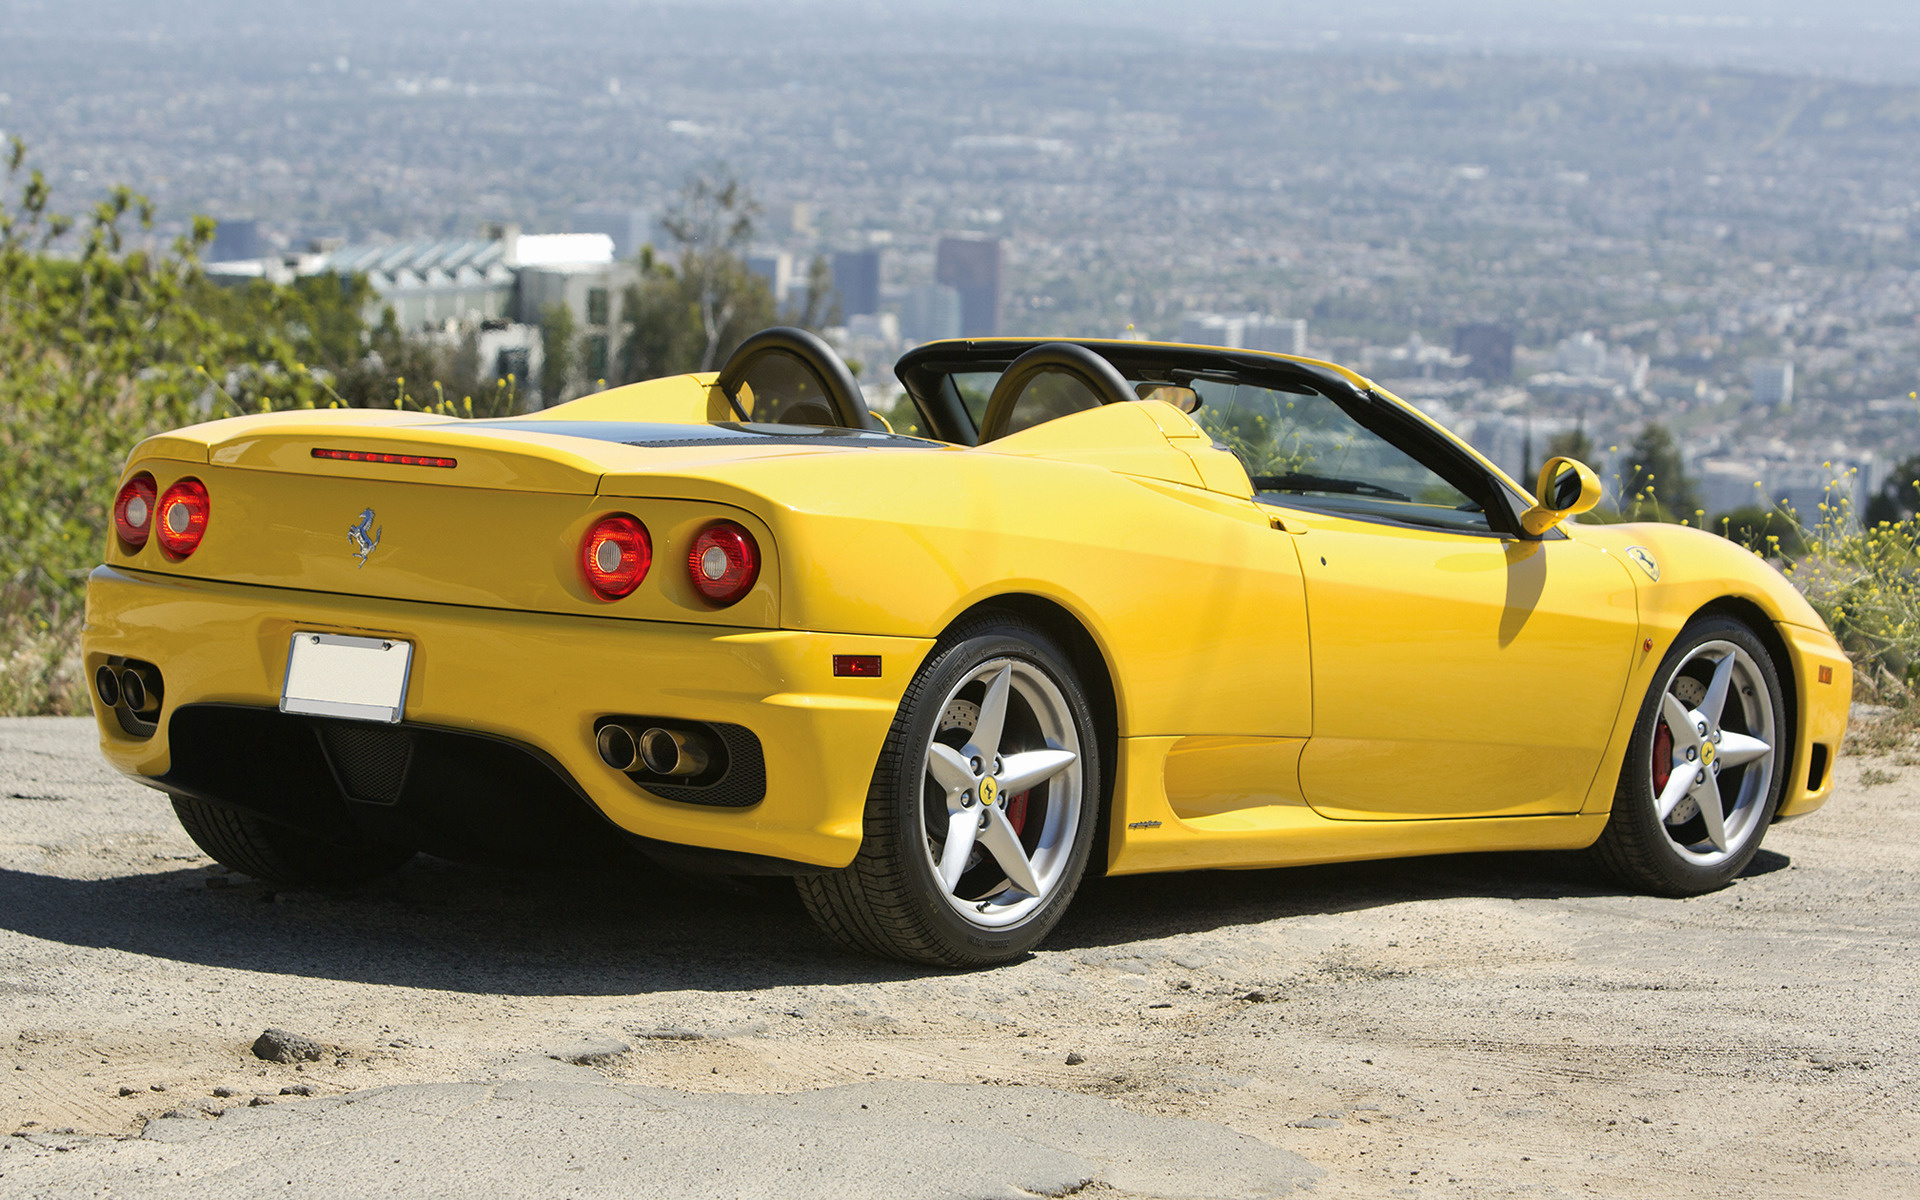 2000 Ferrari 360 Spider (US) - Wallpapers and HD Images | Car Pixel